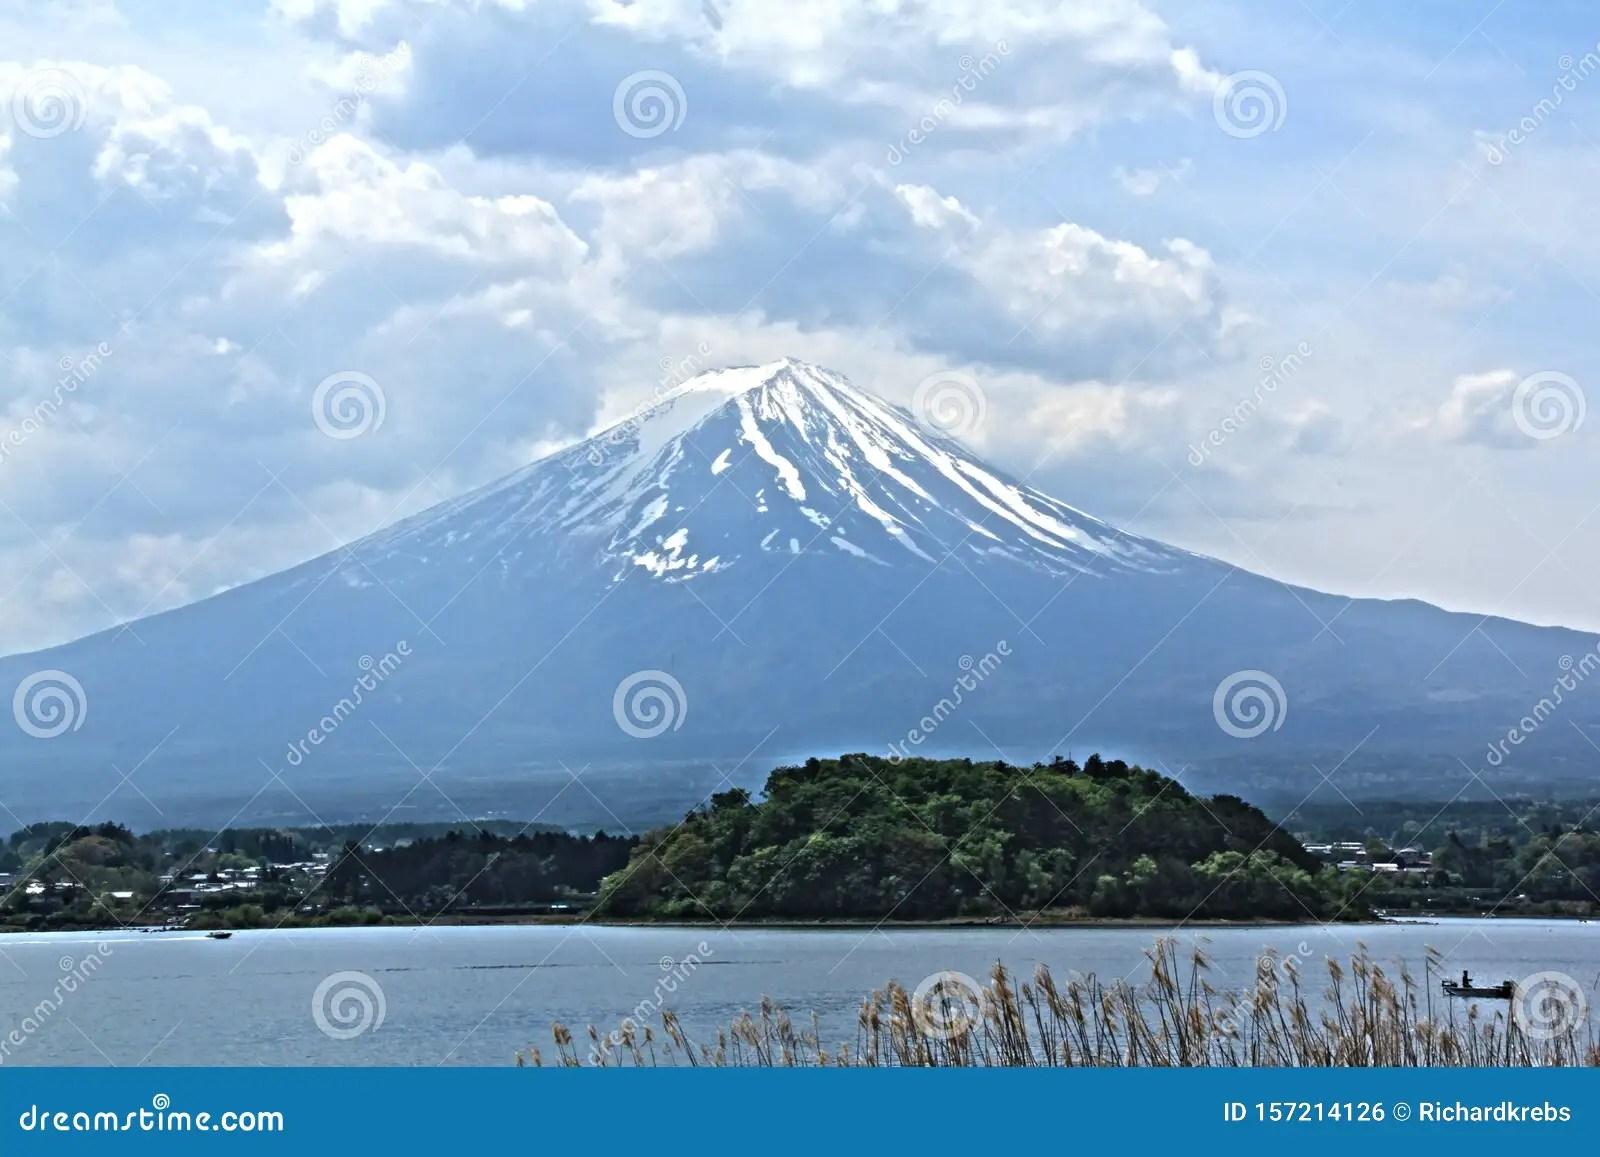 fuji is an active volcano. Mt Fuji Japan Snowcapped Volcano Stock Photo Image Of Local Beautiful 157214126